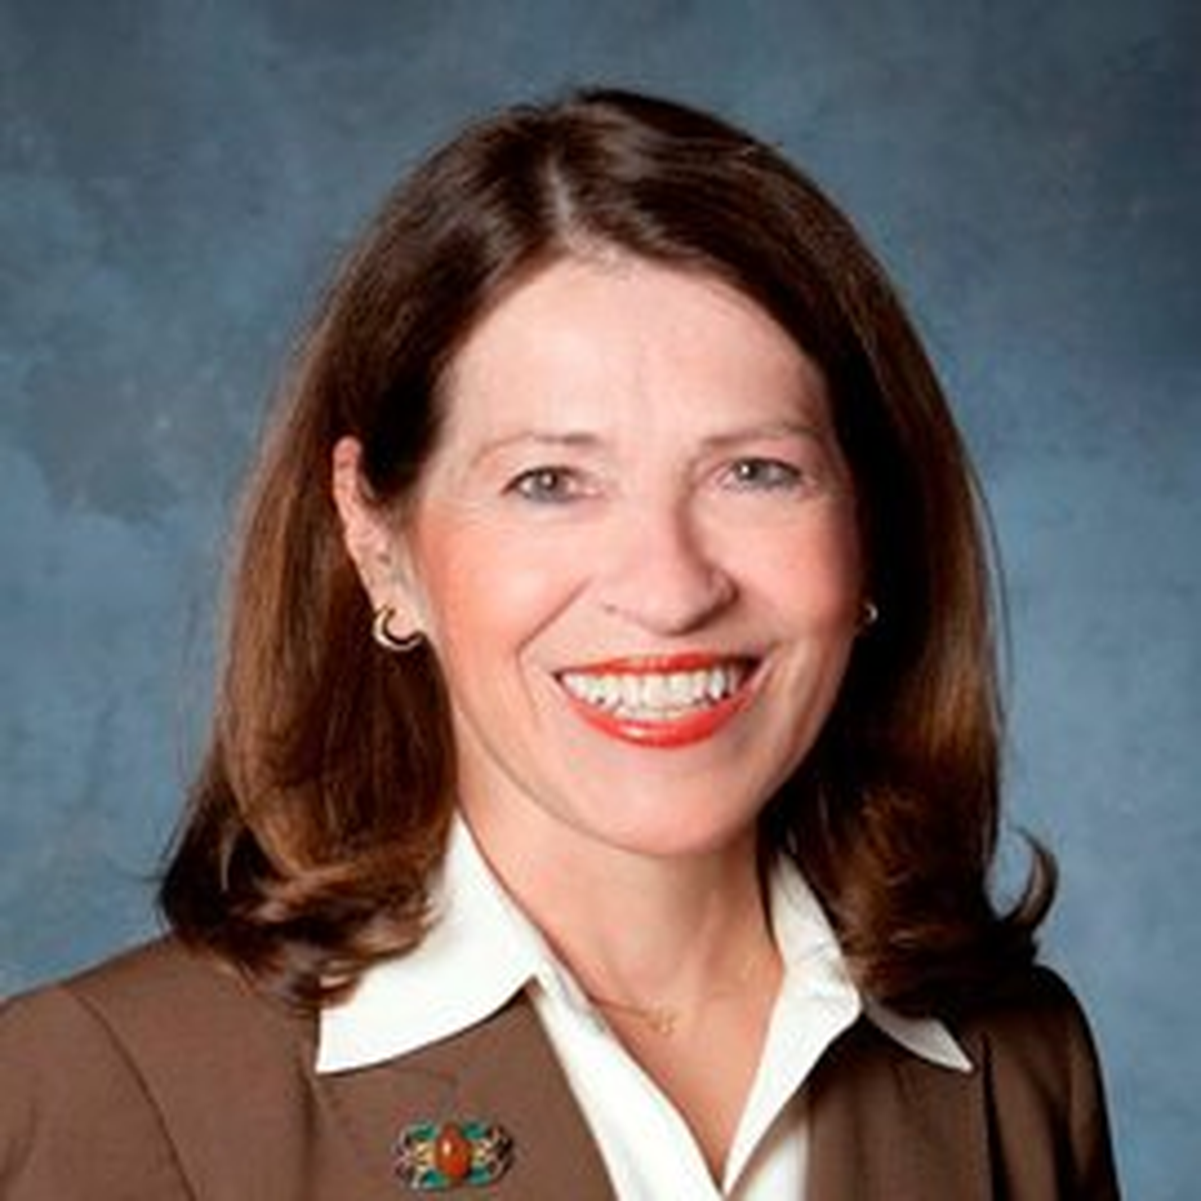 Sally Osberg